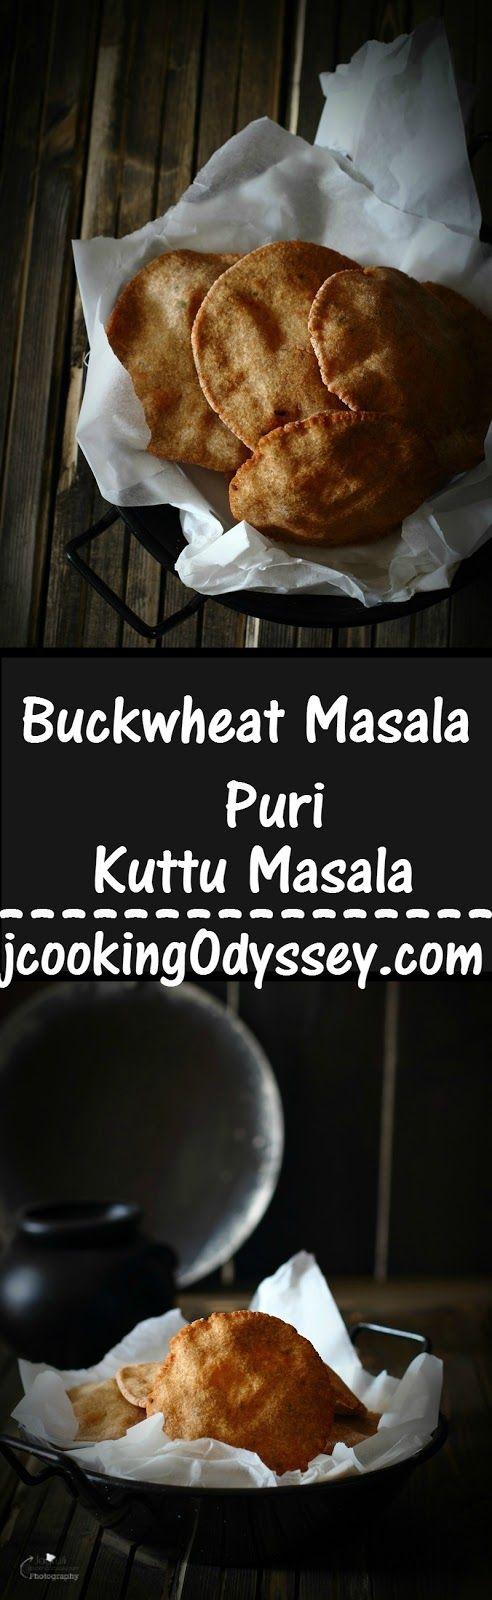 Jagruti's Cooking Odyssey: Farali Masala Puri - Kuttu Ki Masala Puri - Buckwheat Masala Puri #vratkakhana #shravanmonth #faralifood